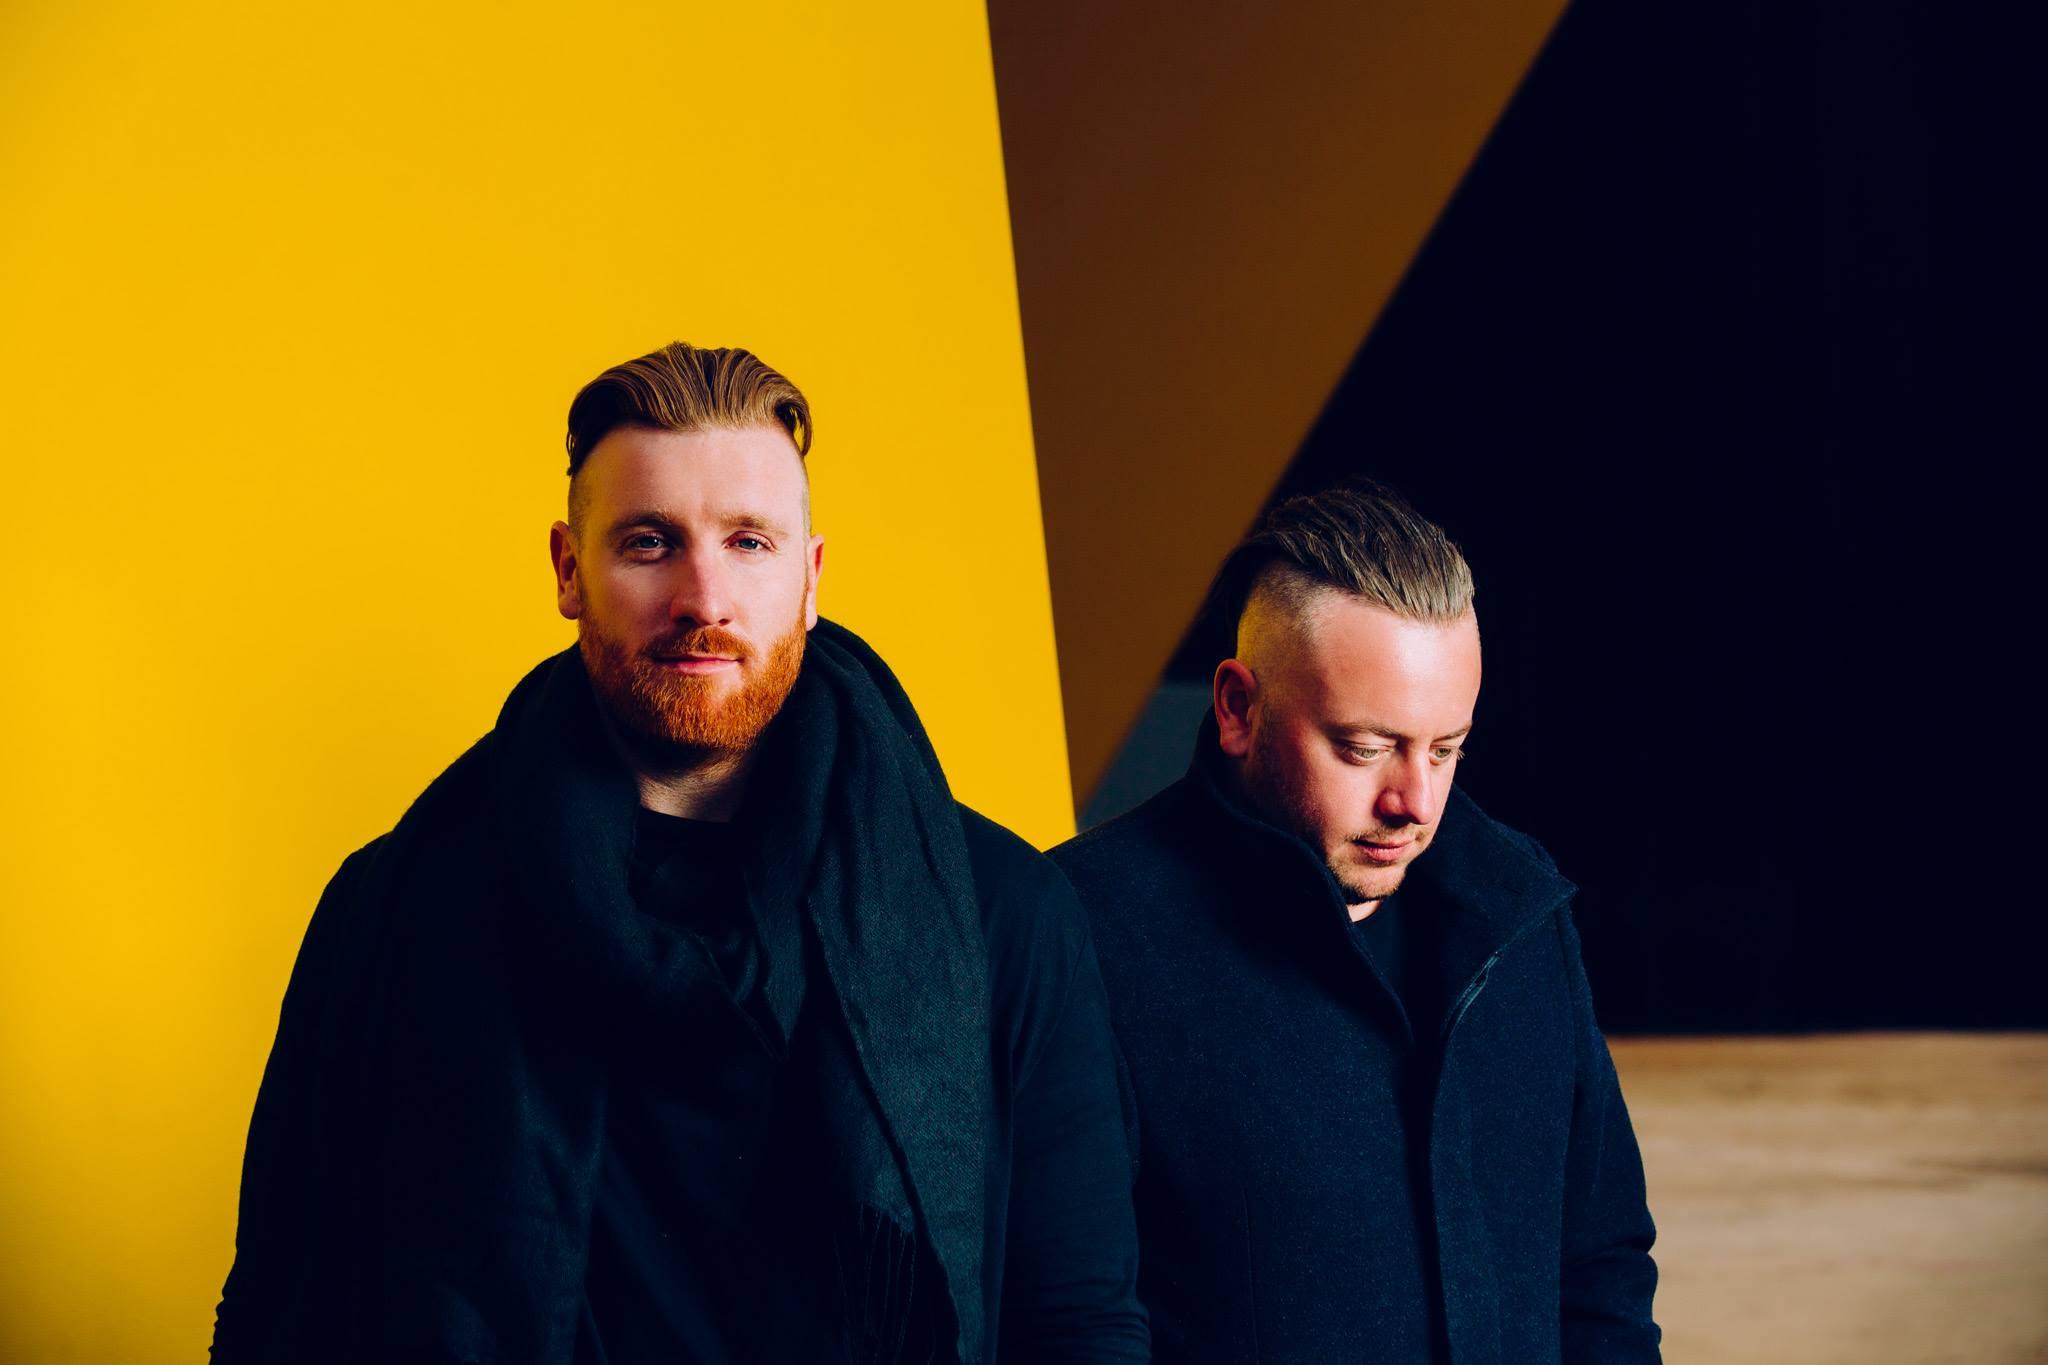 interview the journey electronic music industry music savage thrills savagethrills